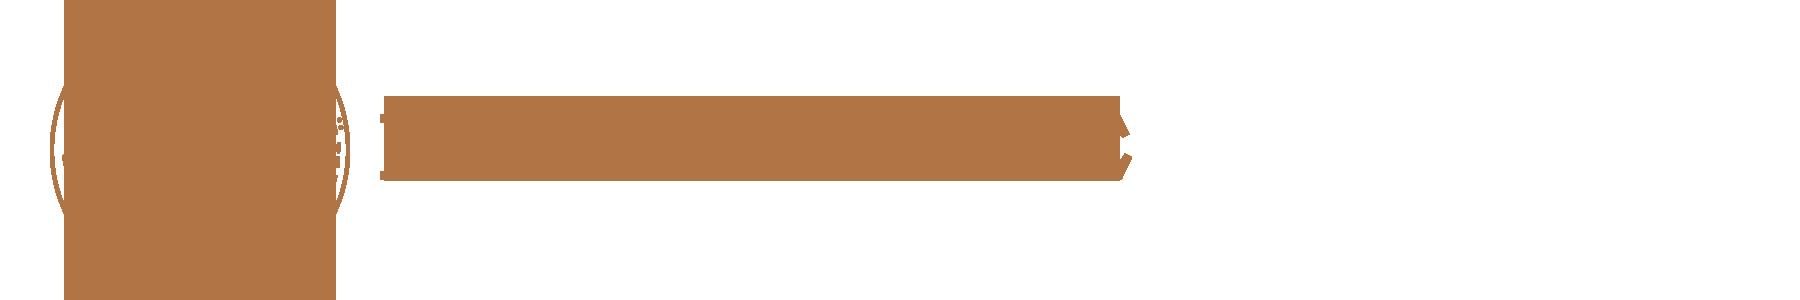 Rätze Mühle